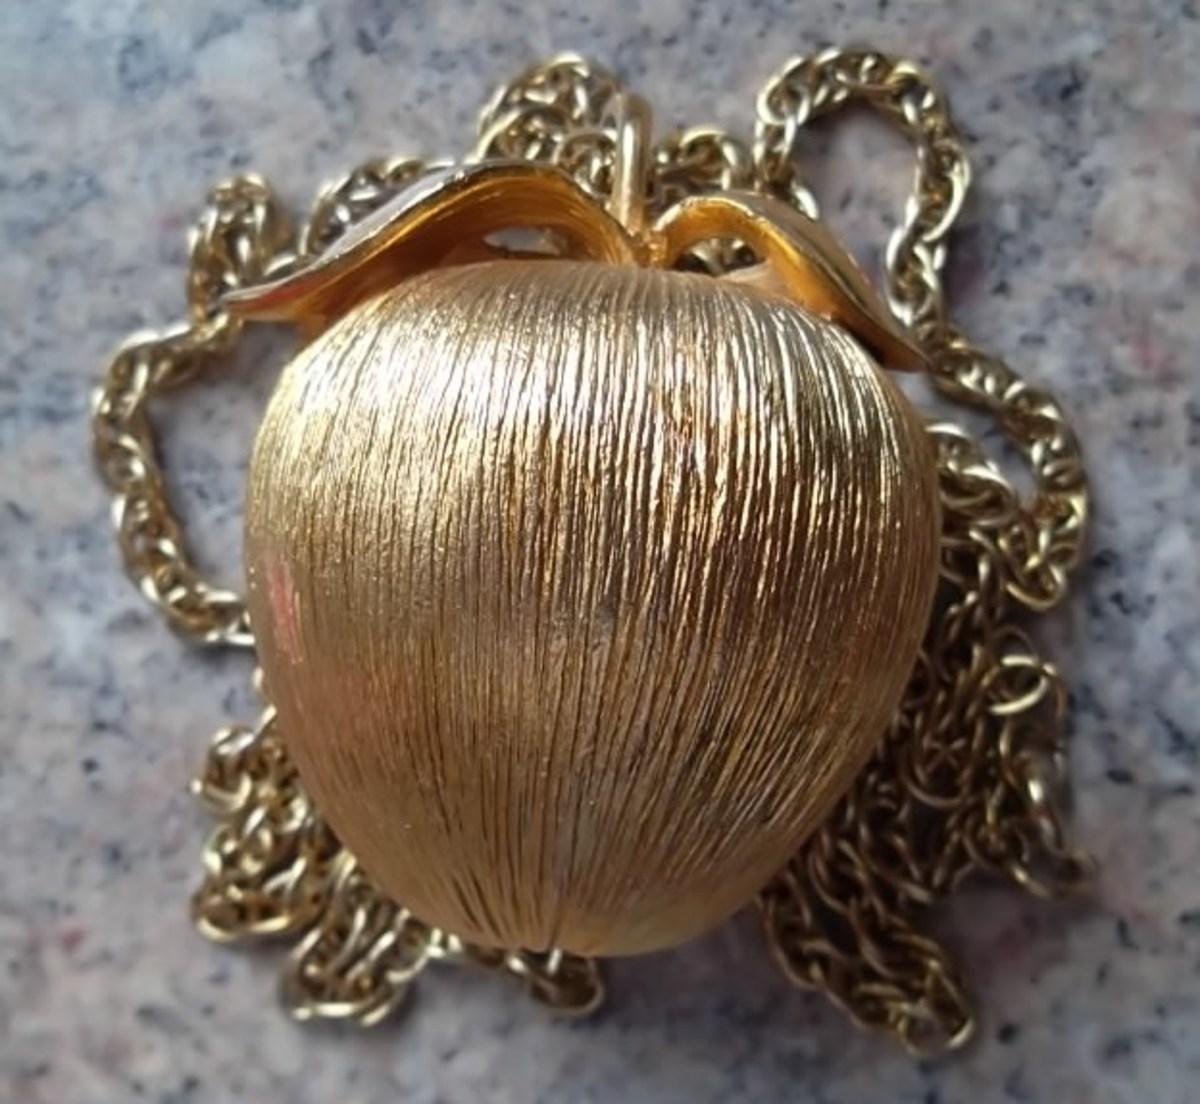 The golden apple pomander